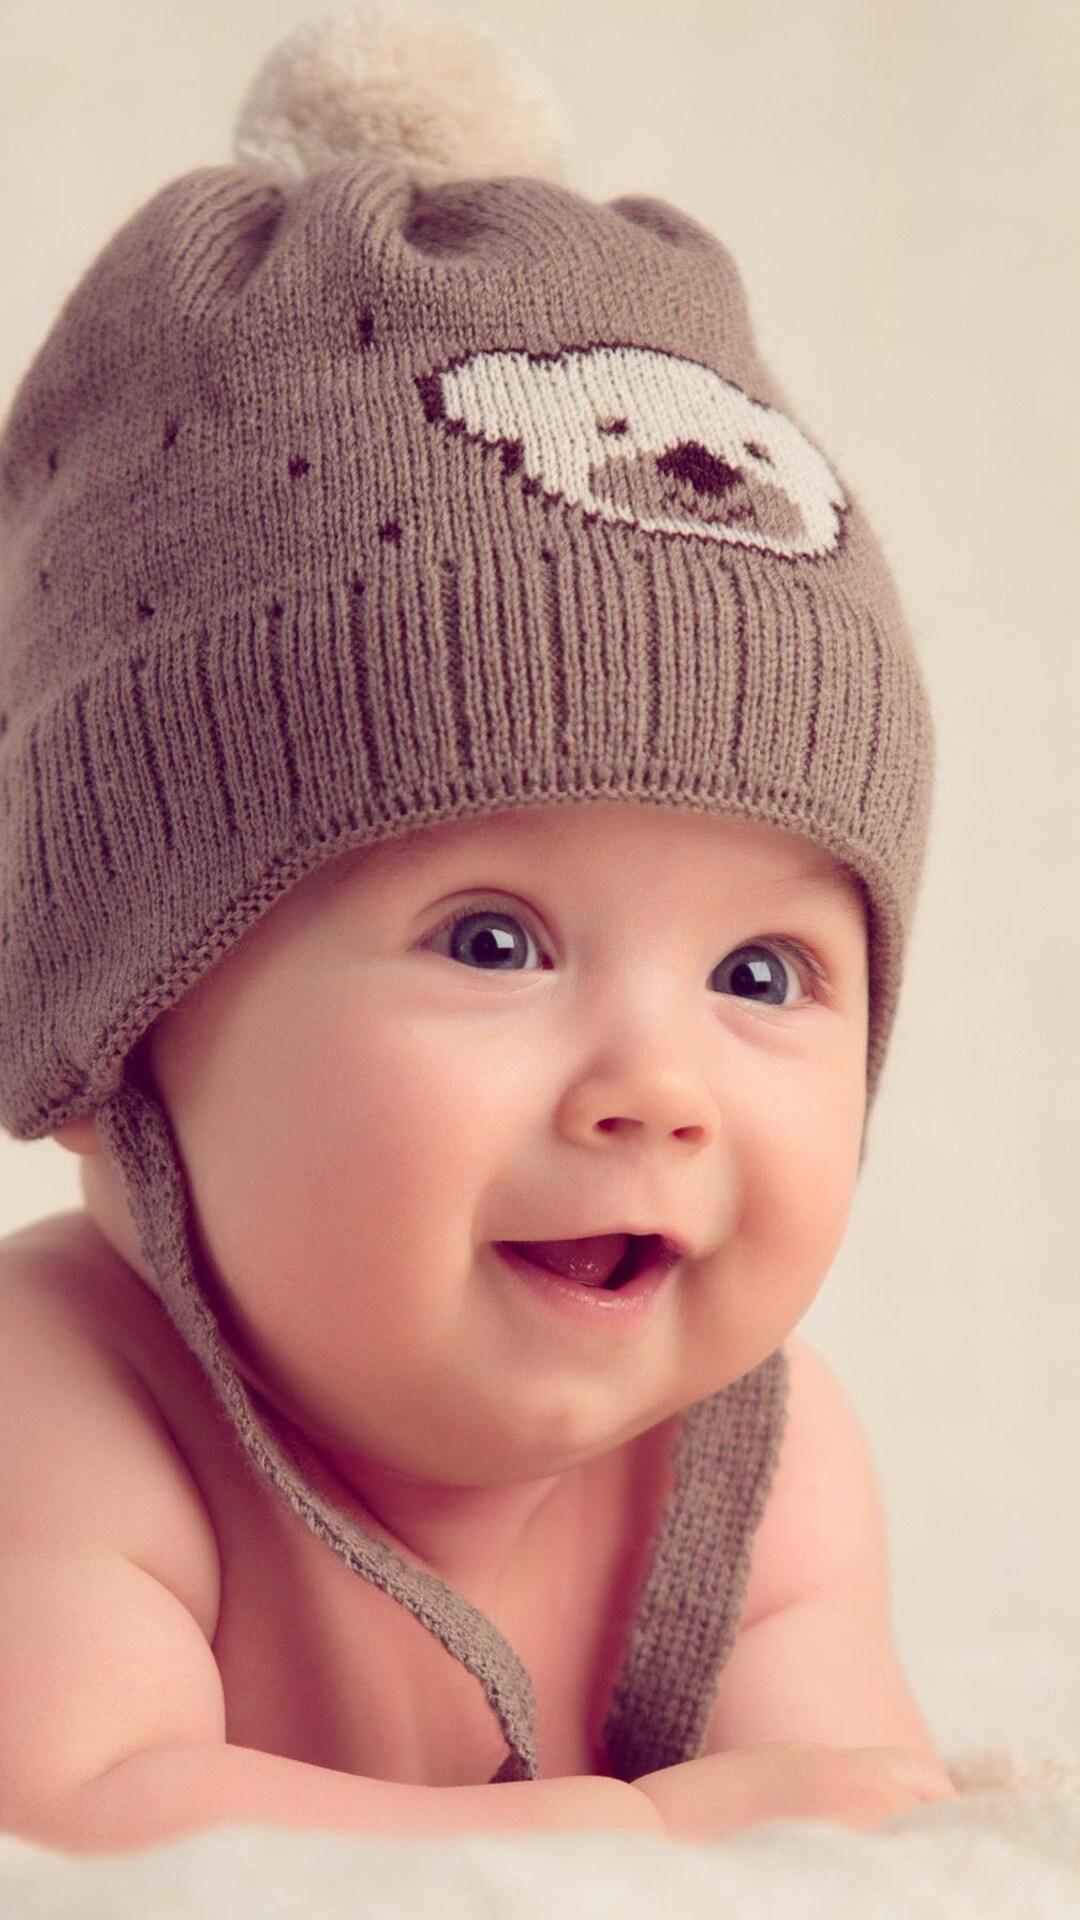 smiling-baby.jpg